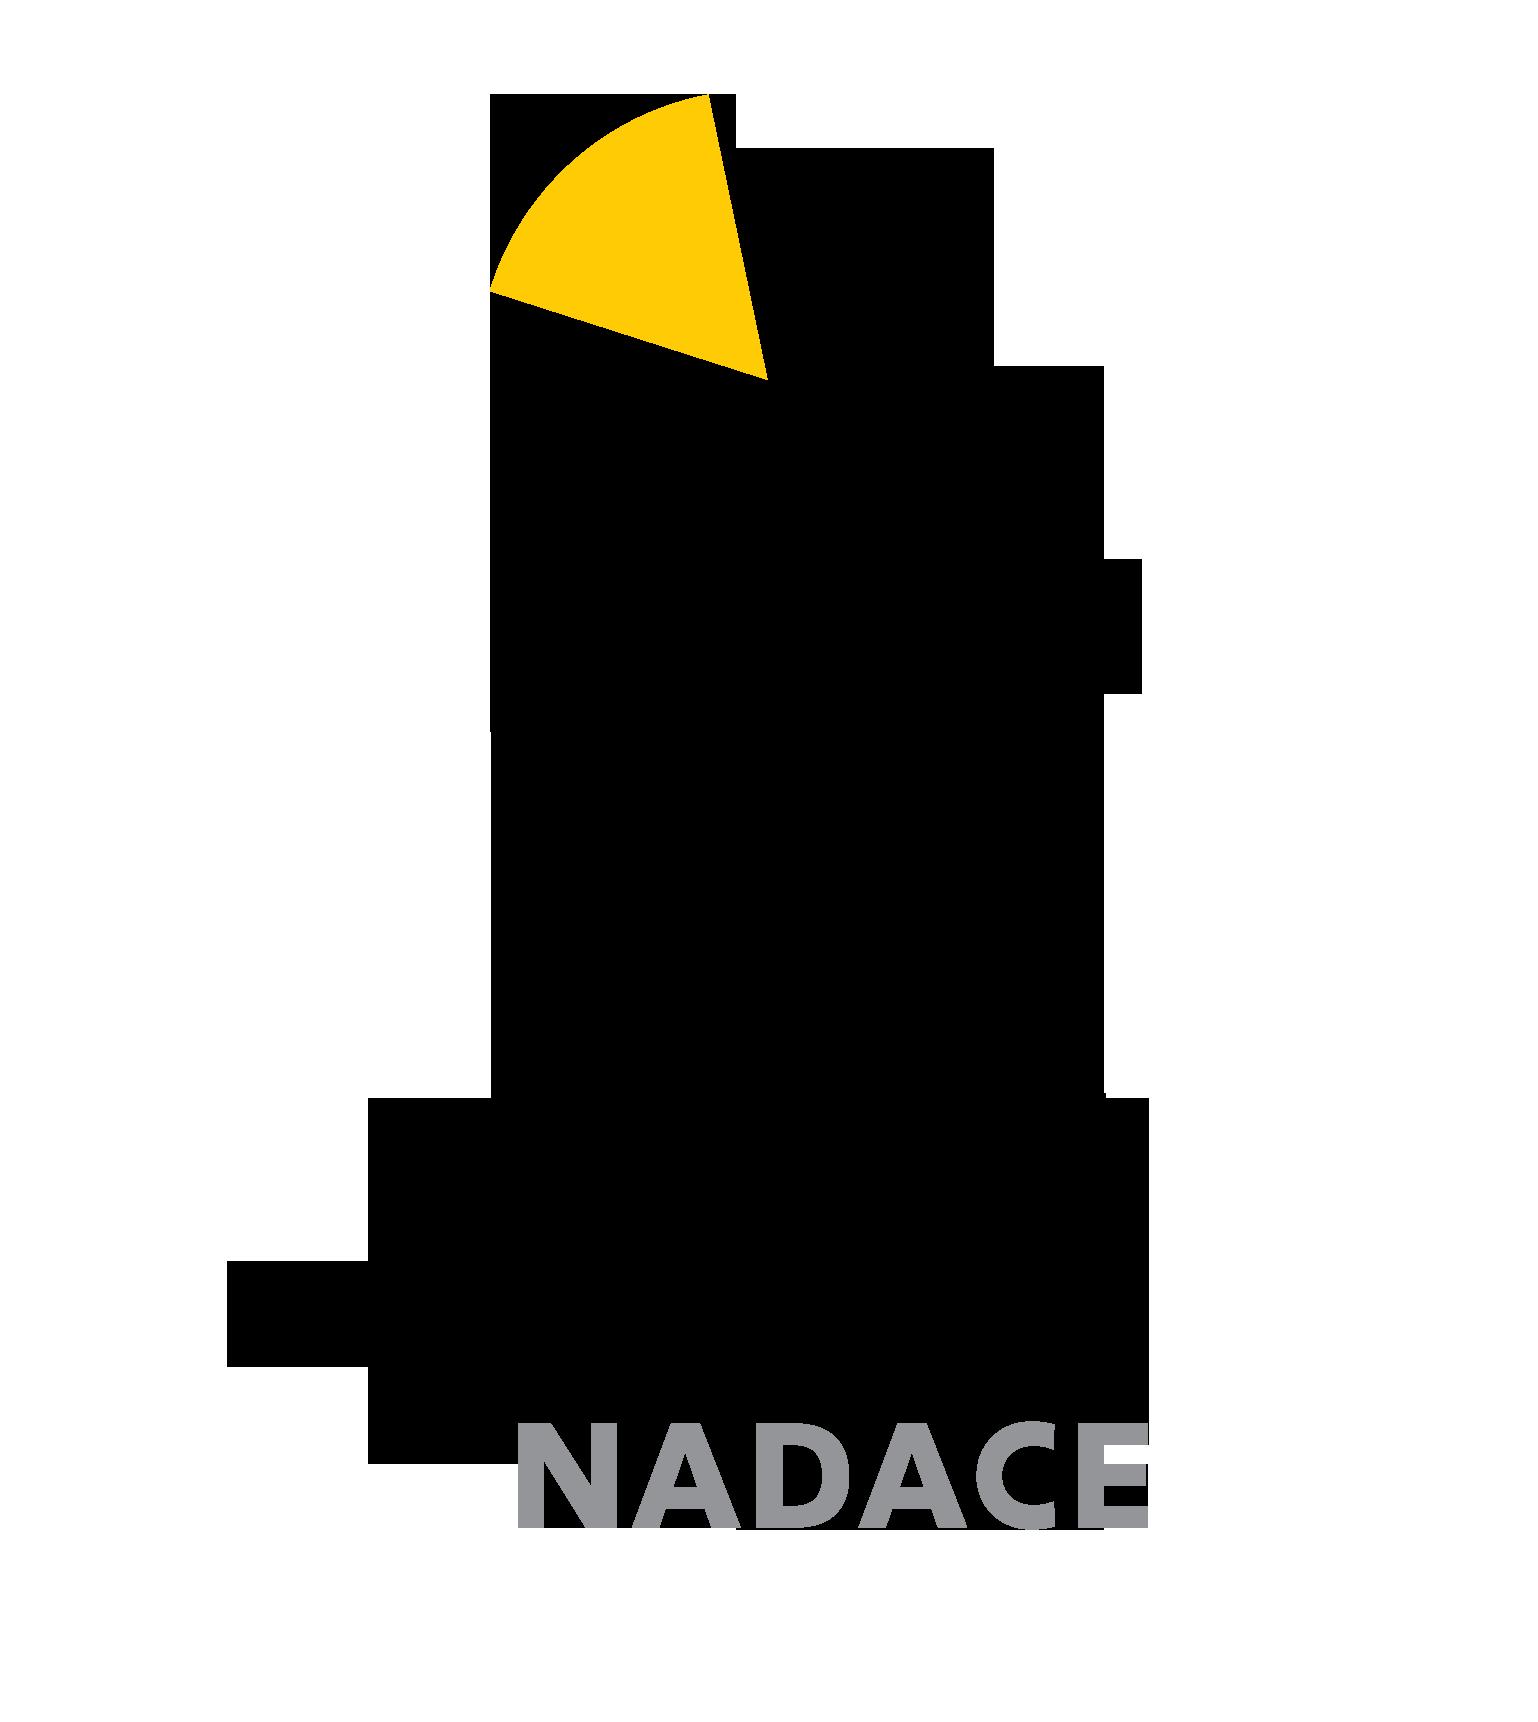 jablotron_nadace_logo.png (48 KB)